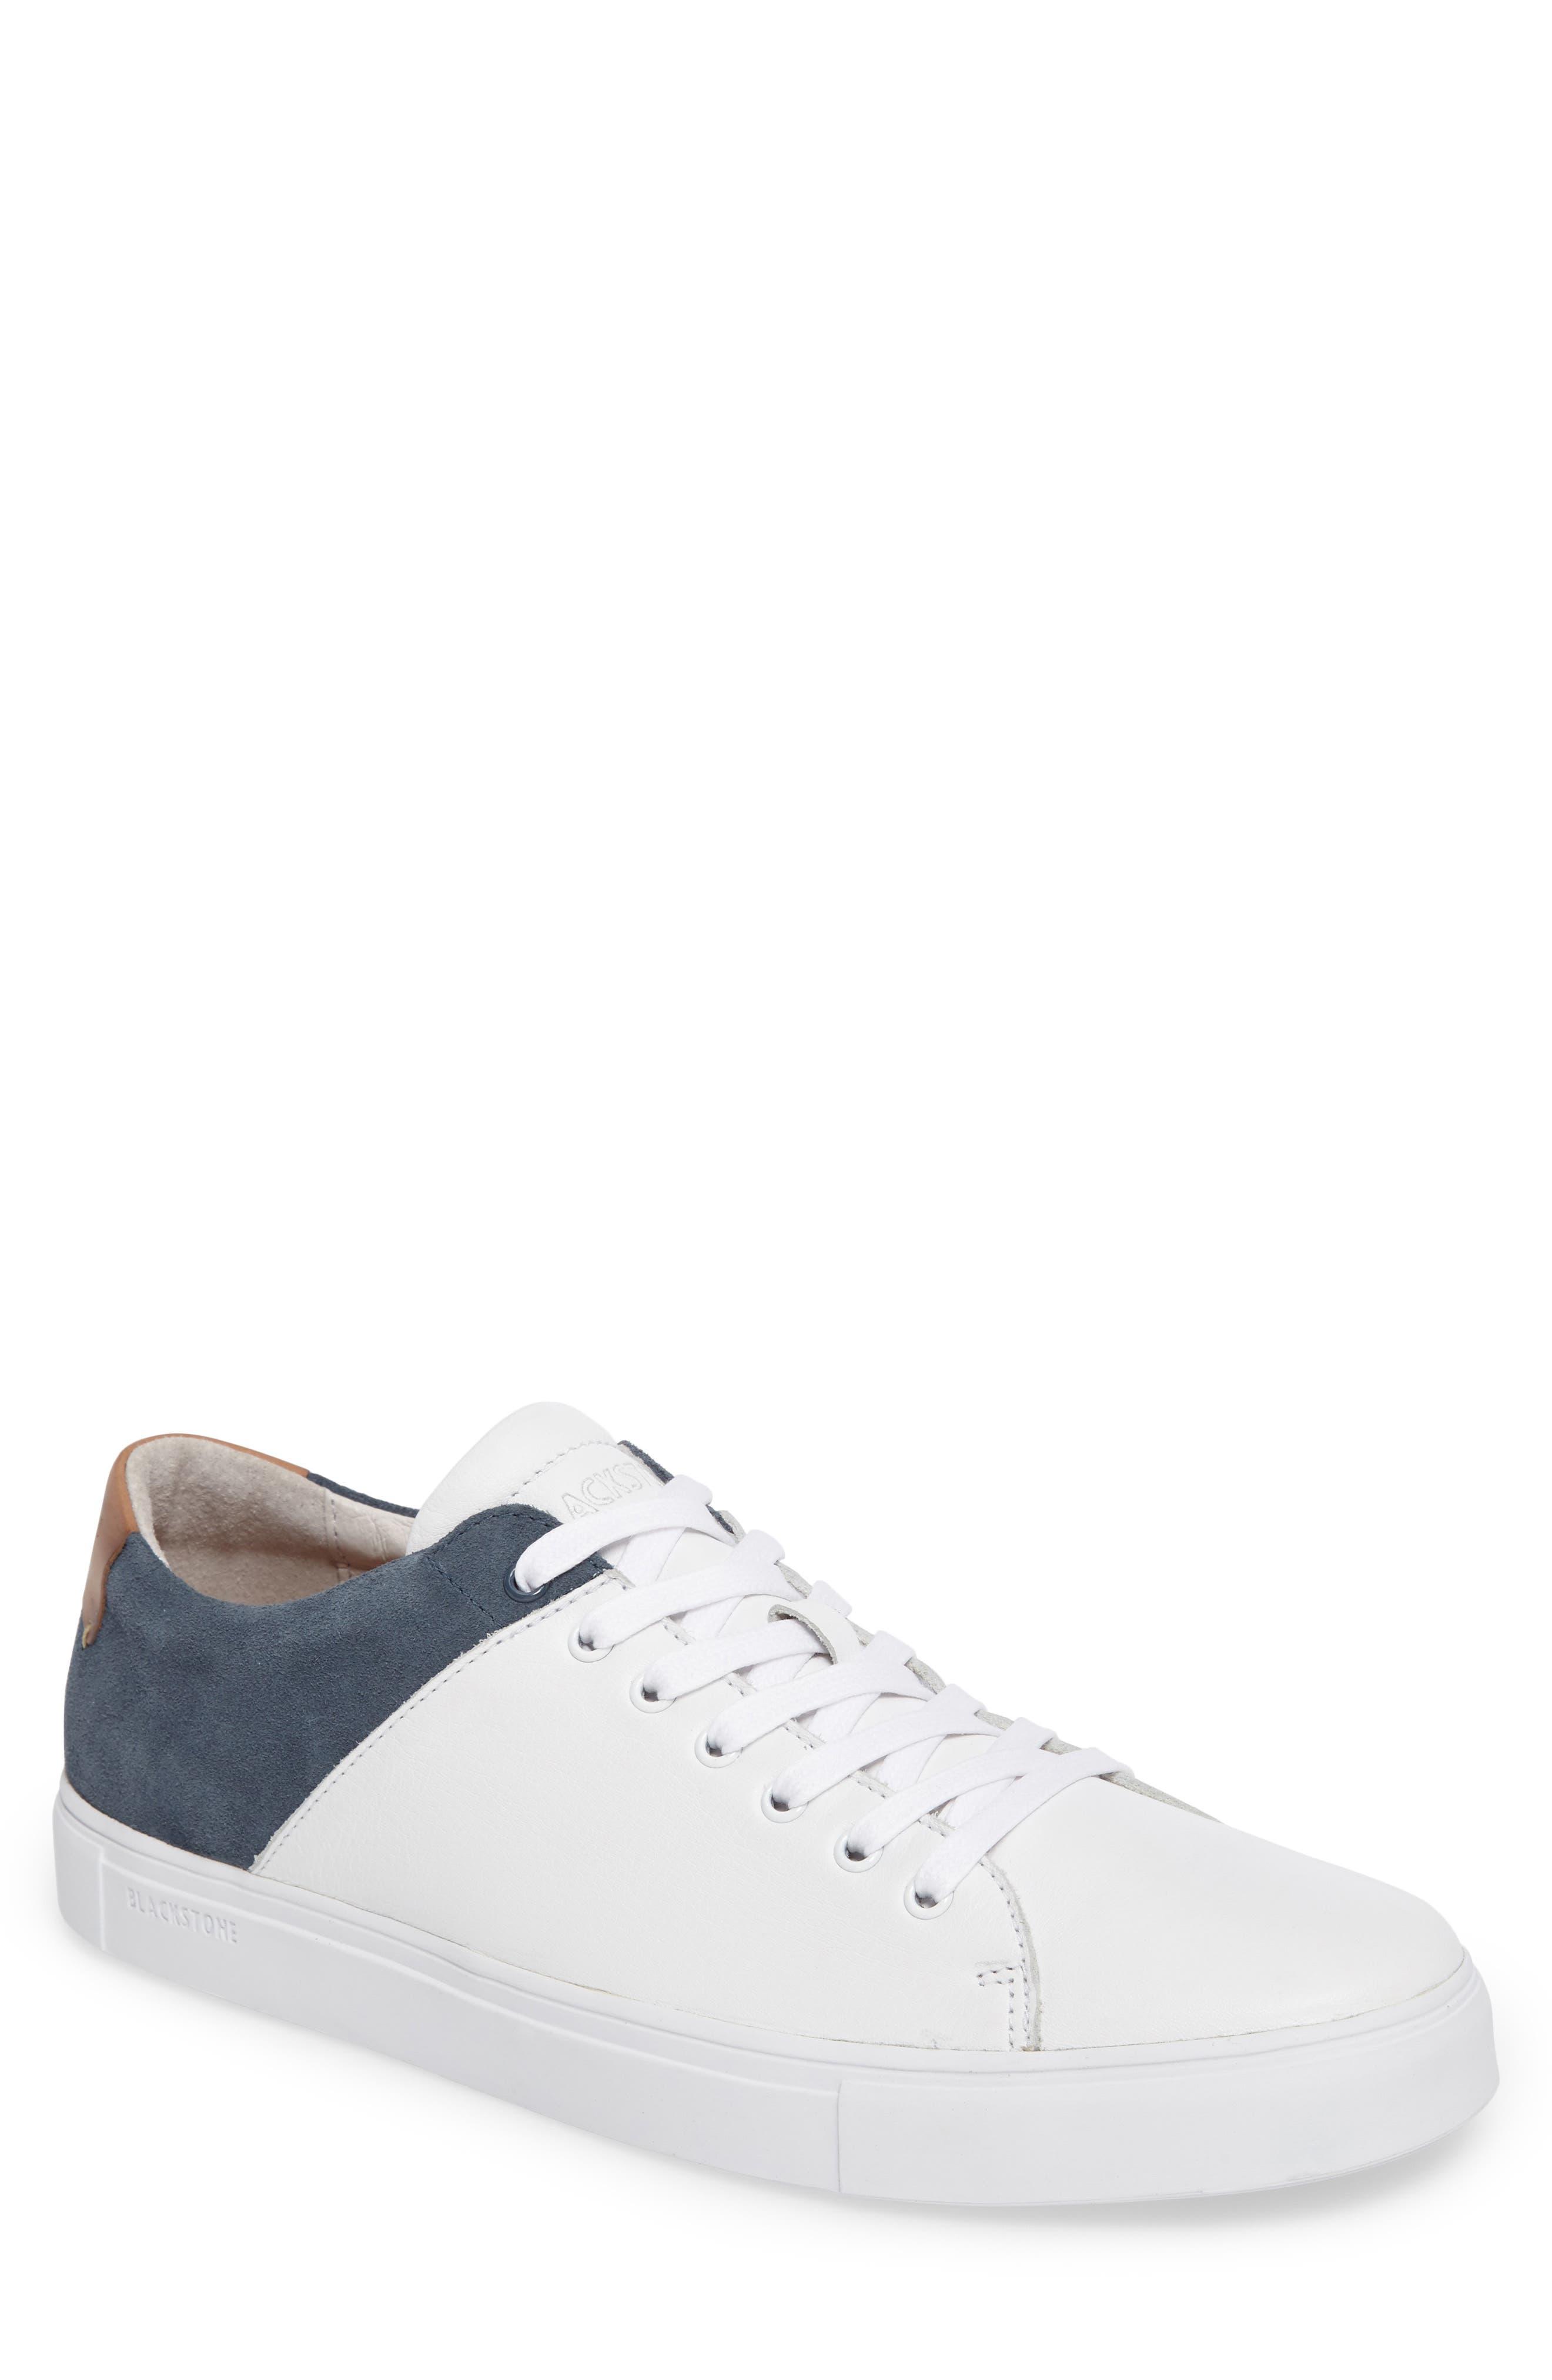 Main Image - Blackstone NM03 Two-Tone Sneaker (Men)